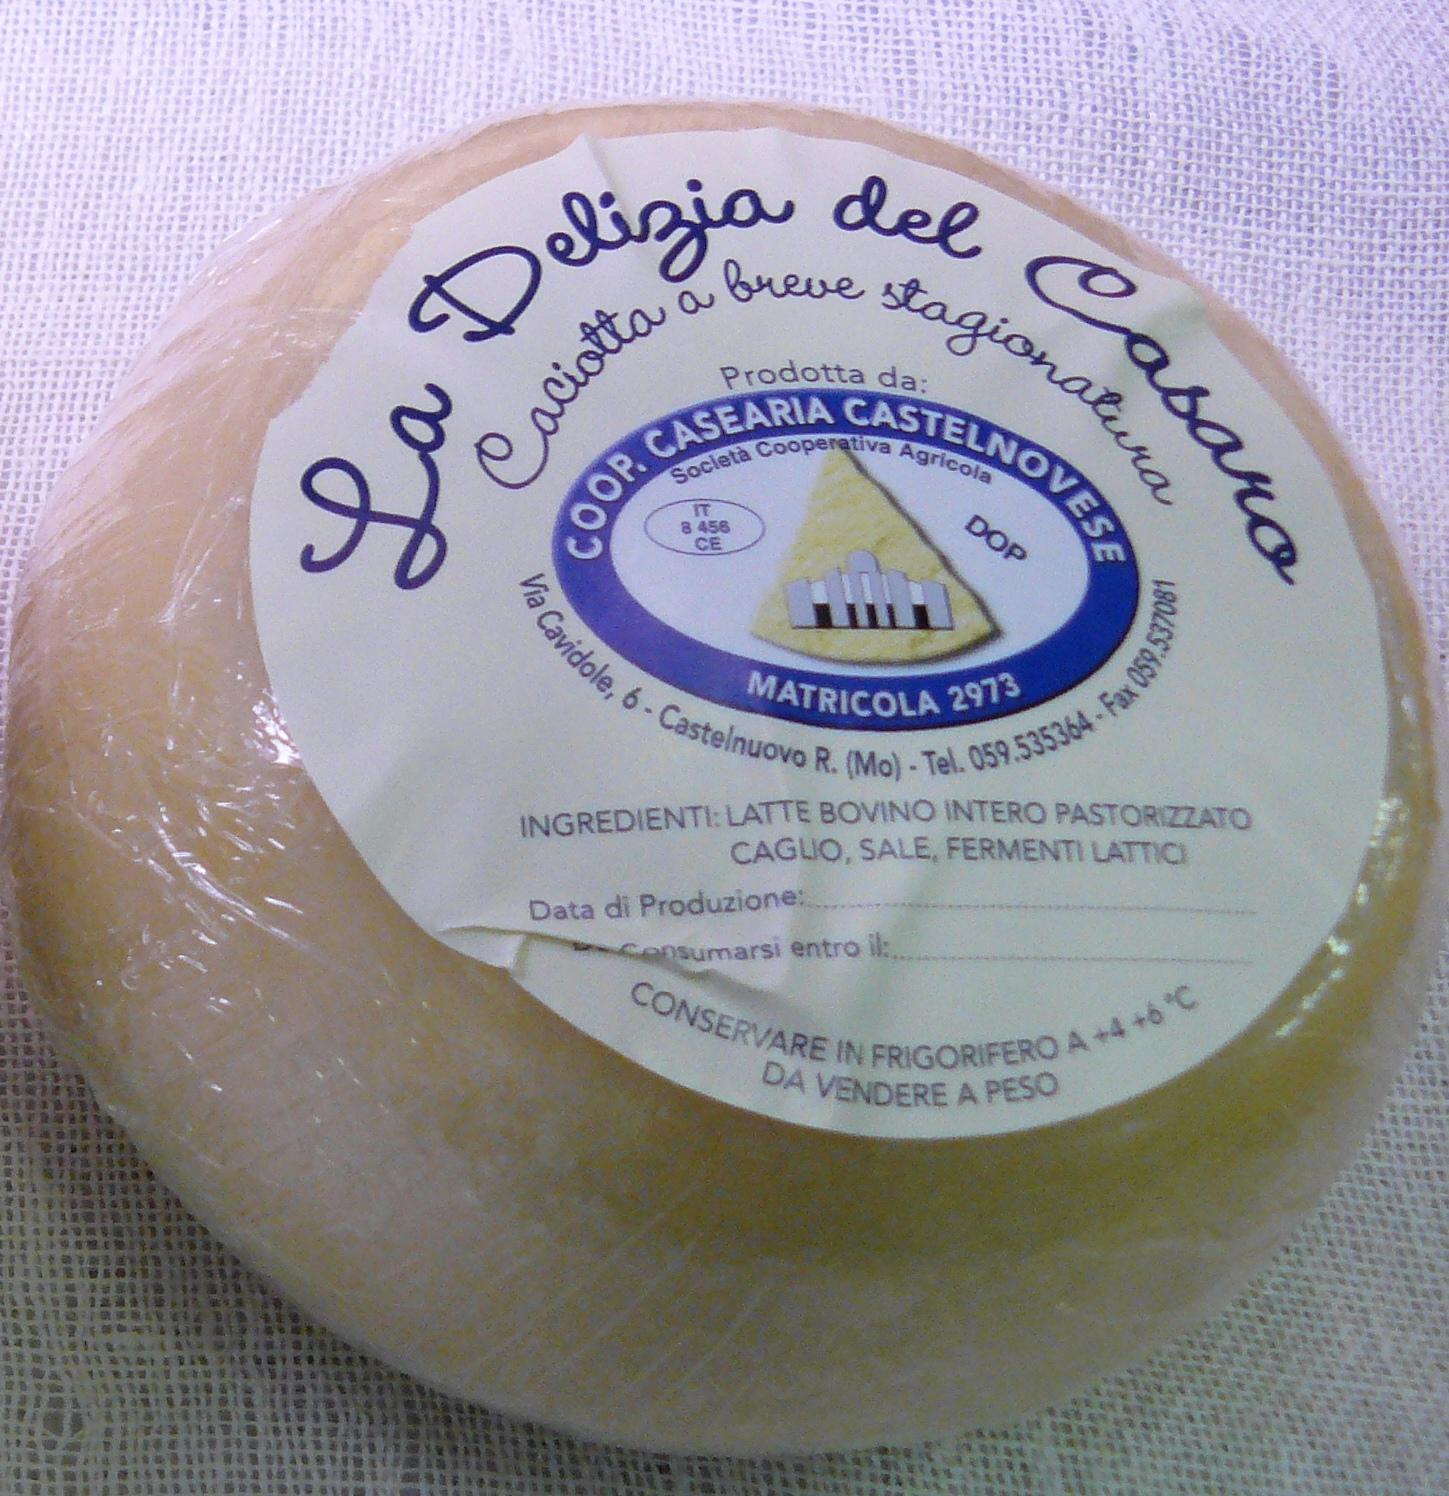 Caciotta Image